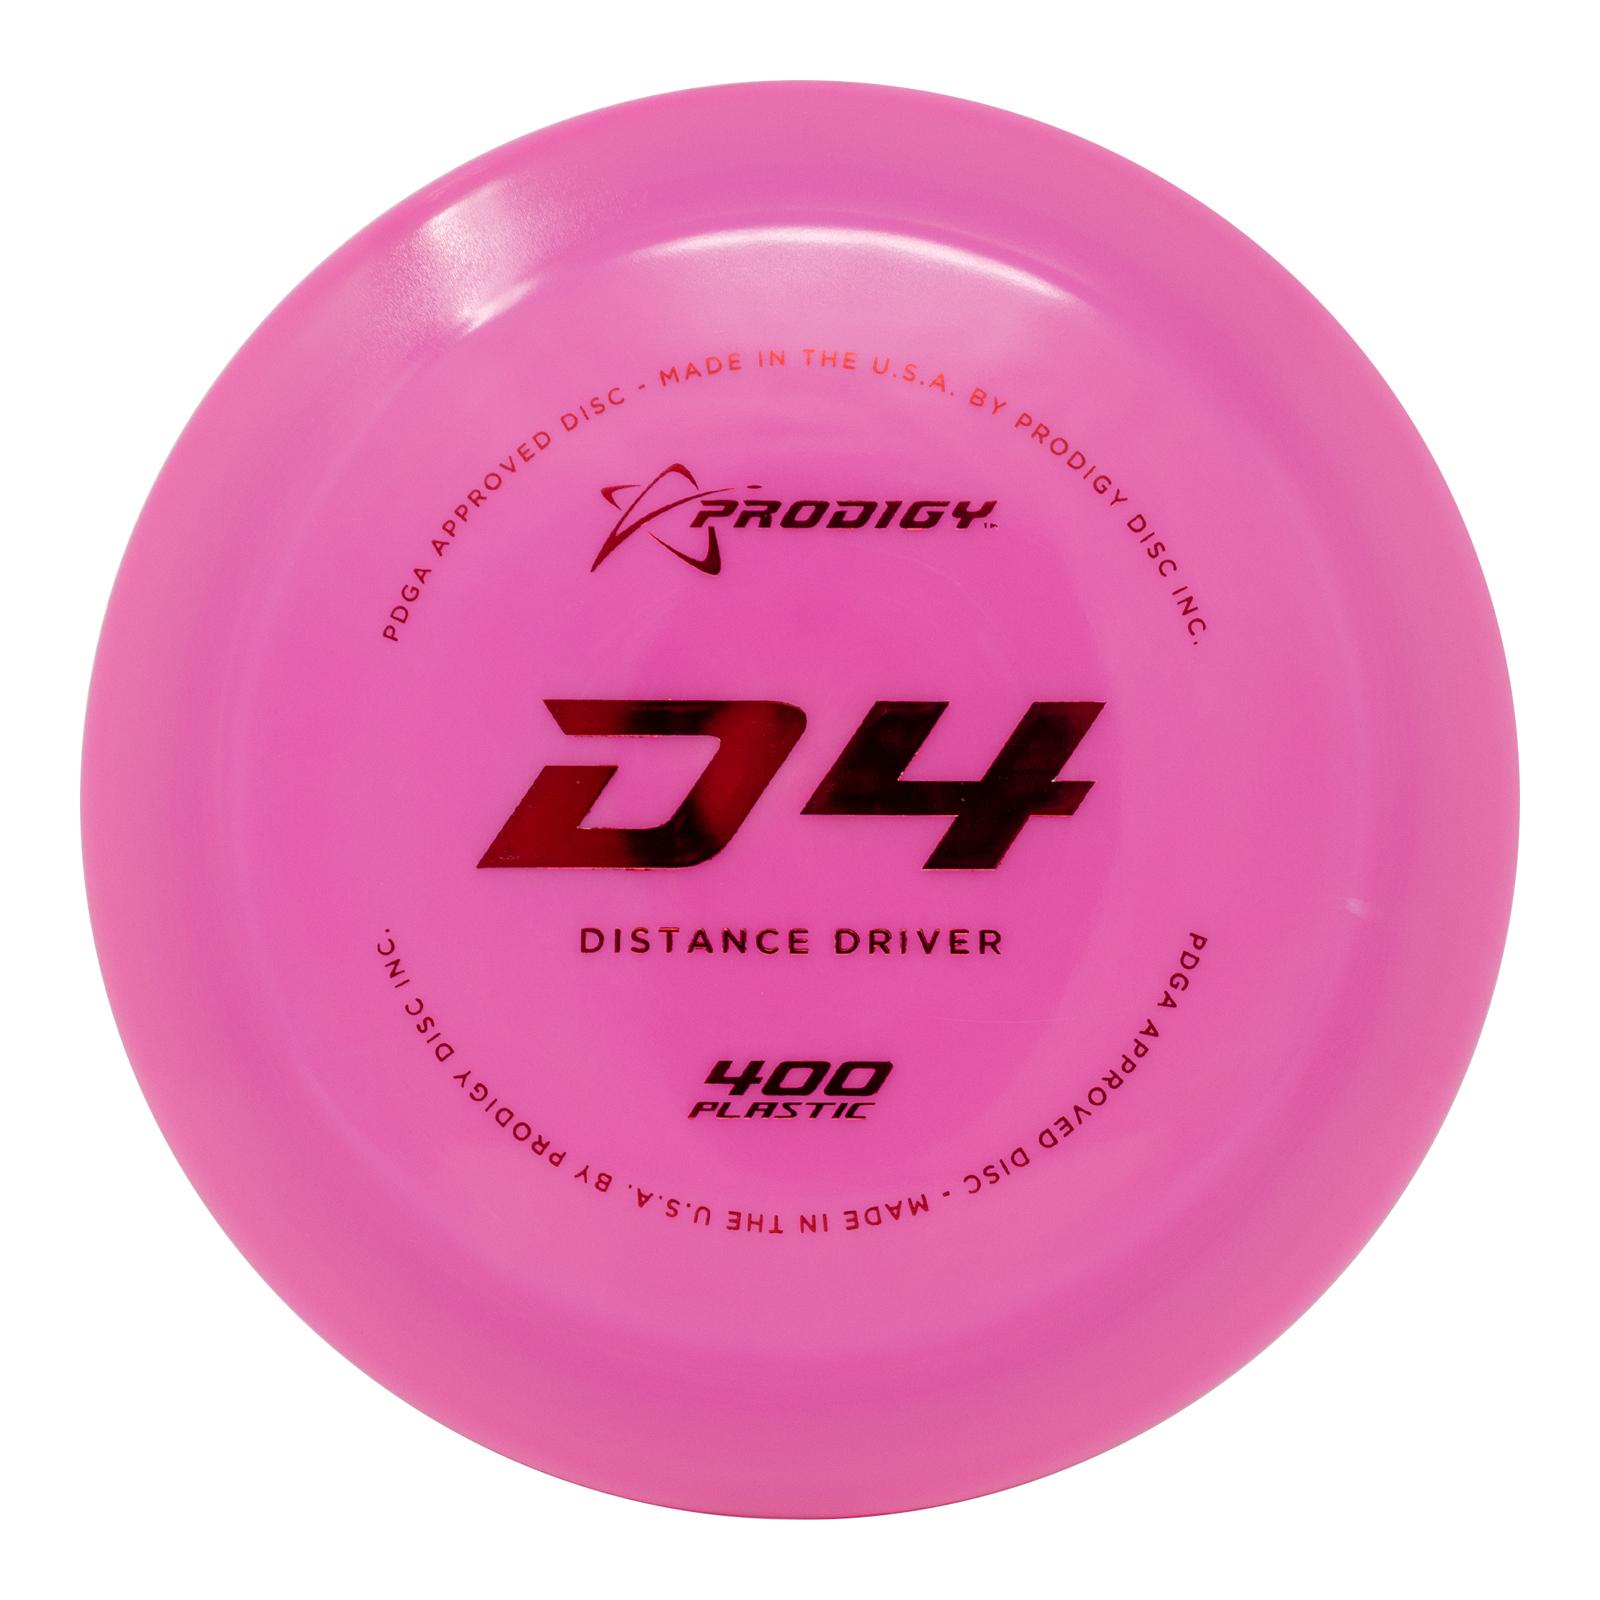 D4 - 400 PLASTIC